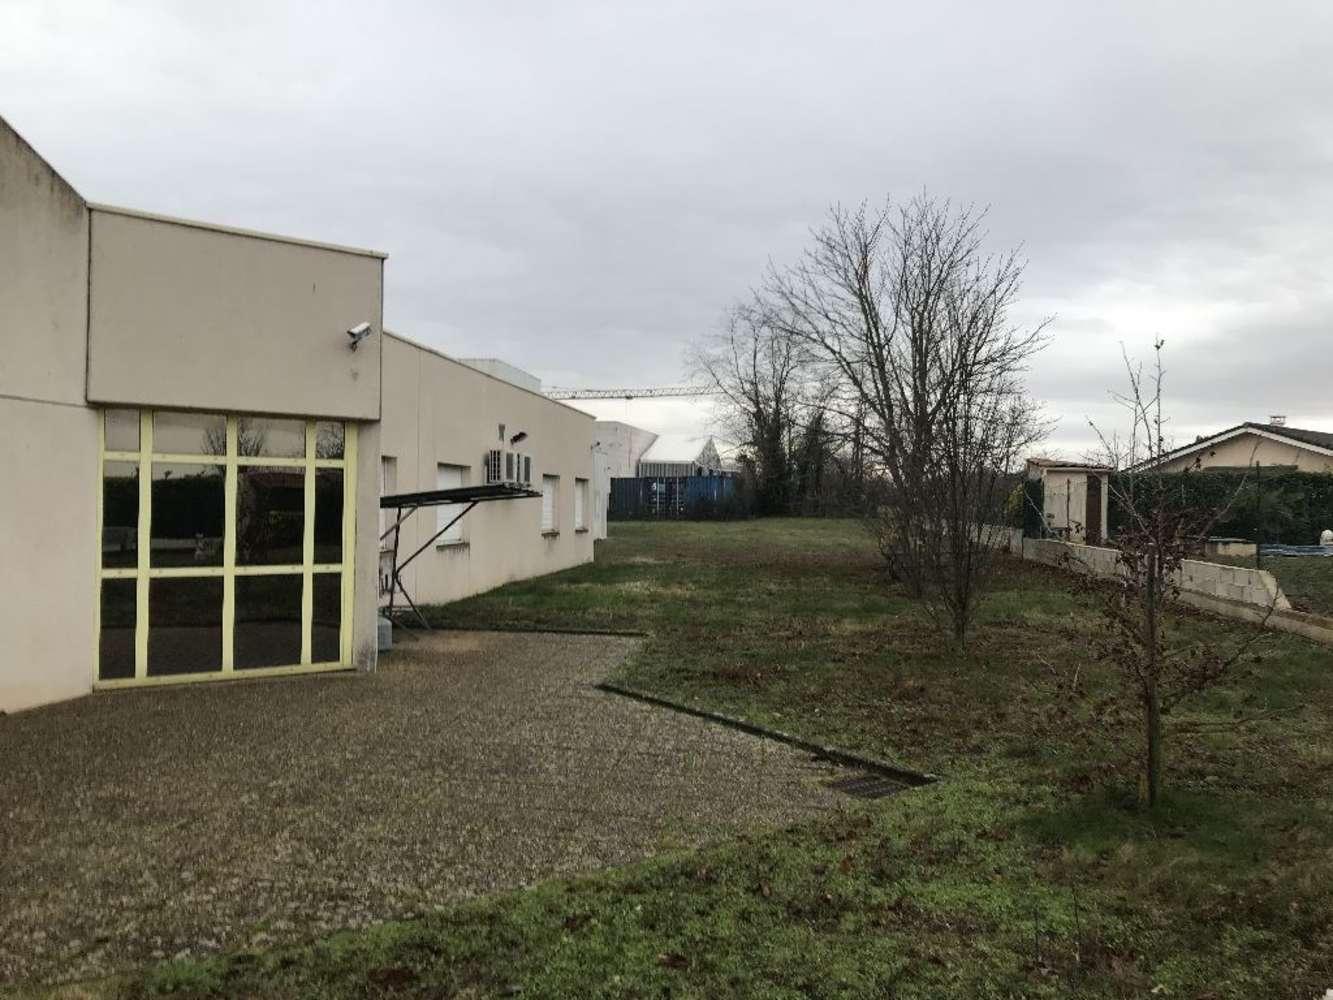 Activités/entrepôt Meyzieu, 69330 - Entrepot à vendre Meyzieu (Lyon Est) - 9862434